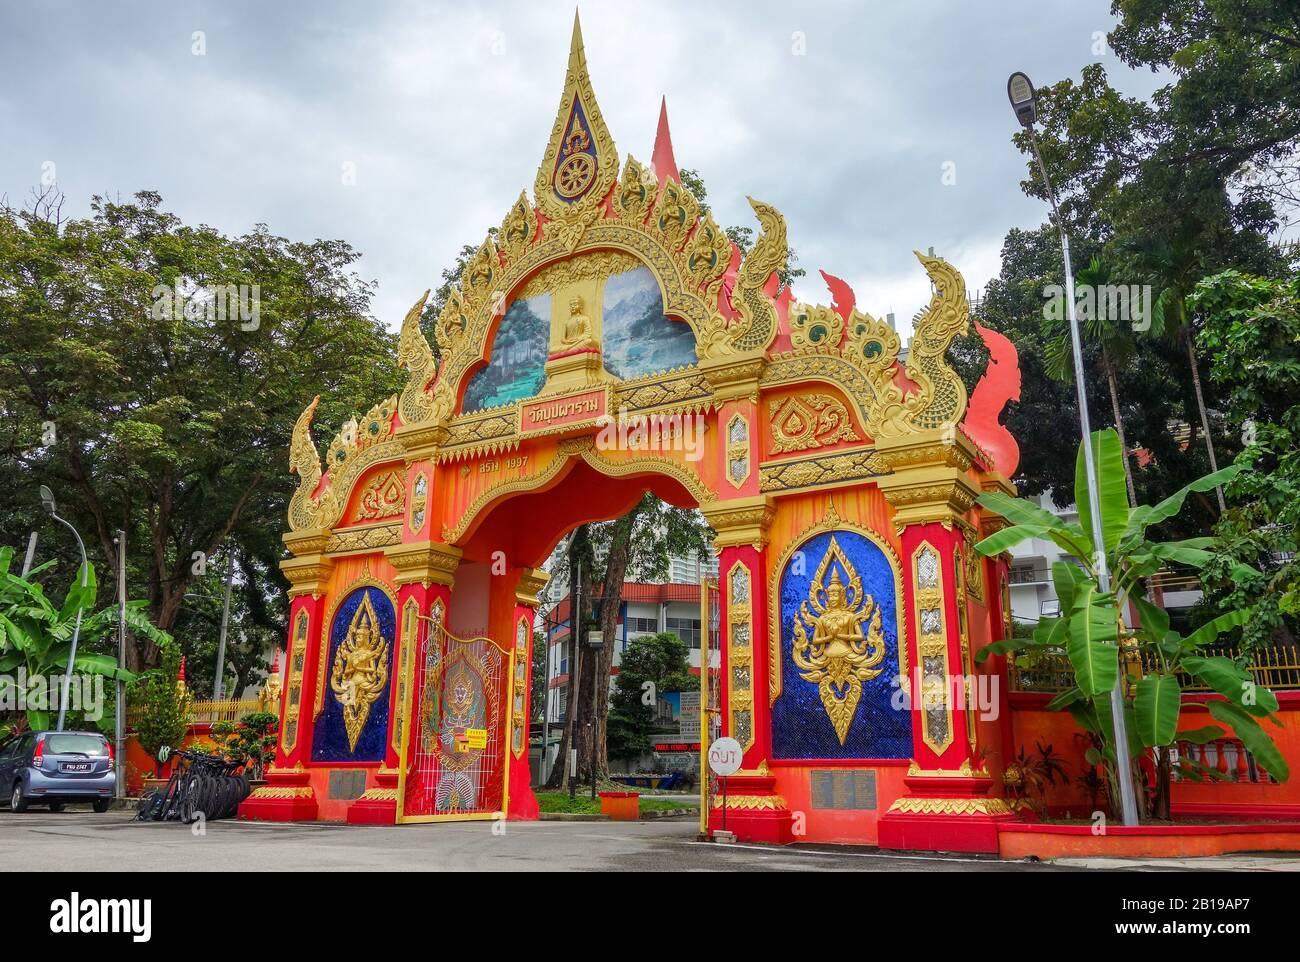 Penang, Malaysia. 02nd Dec, 2019. Buddhist Temple Wat Buppharam. Credit: Damian Gollnisch/dpa-Zentralbild/ZB/dpa/Alamy Live News Stock Photo